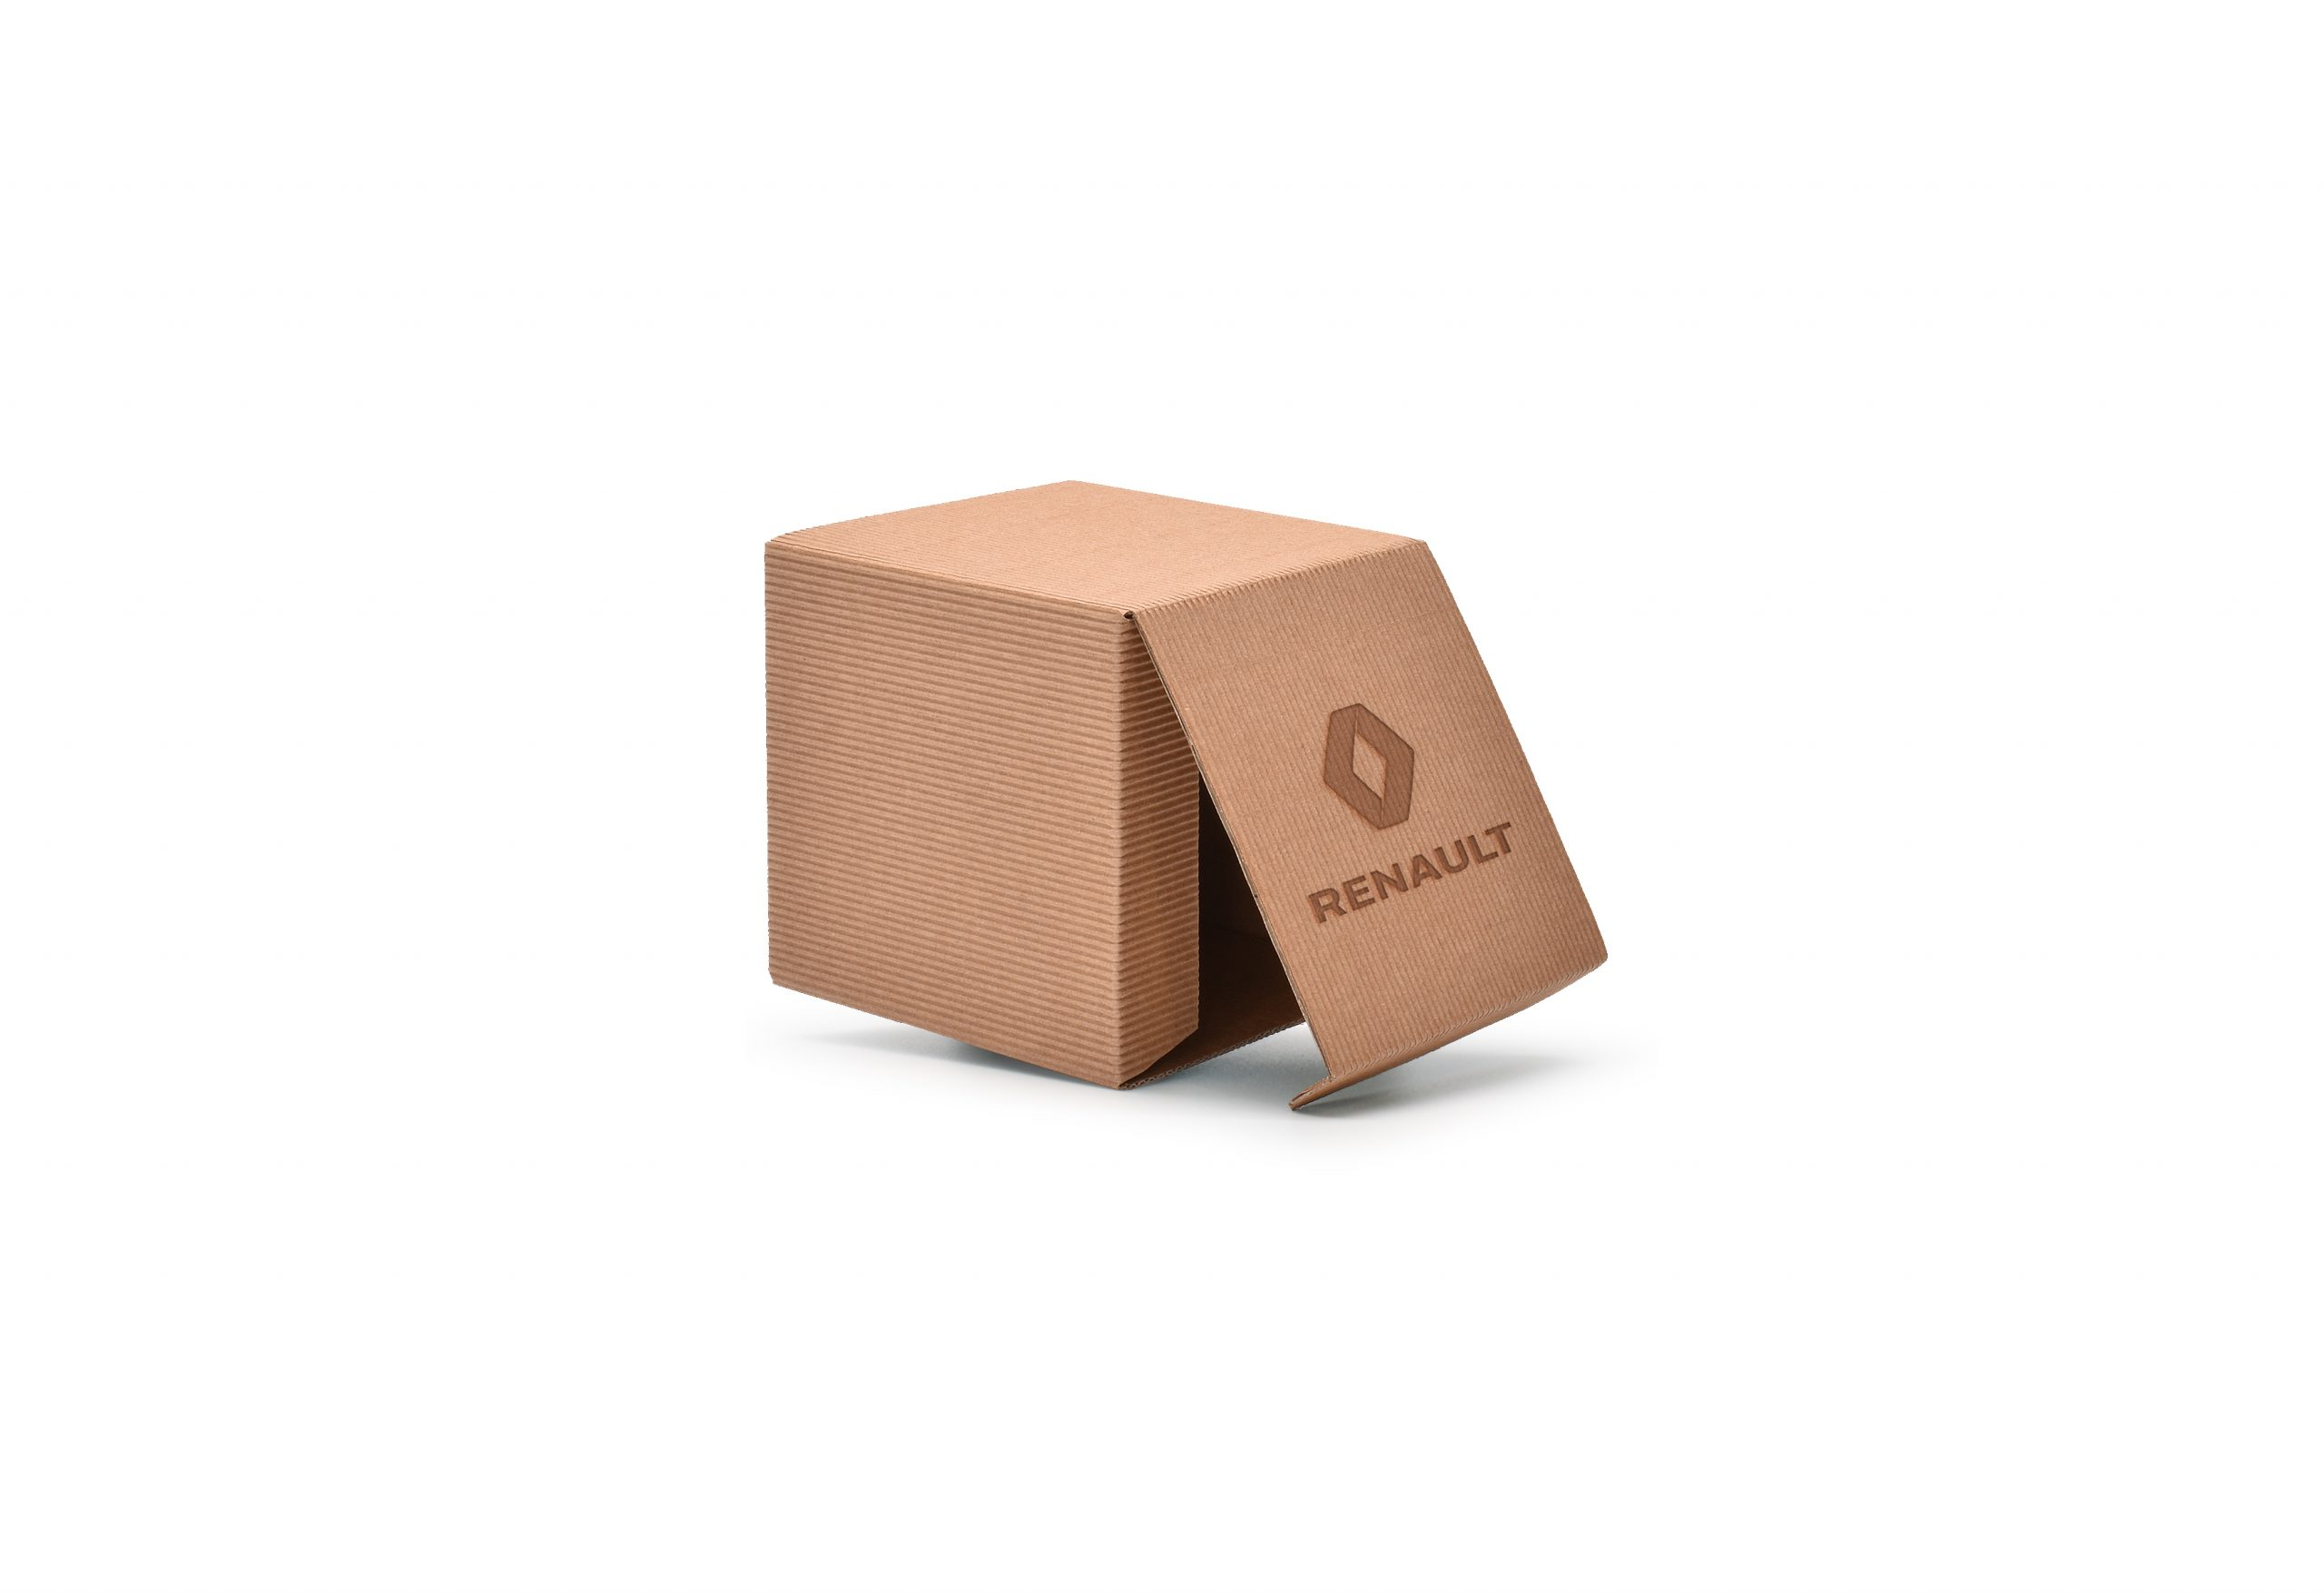 embalagem_logo_em_revelo_Renault